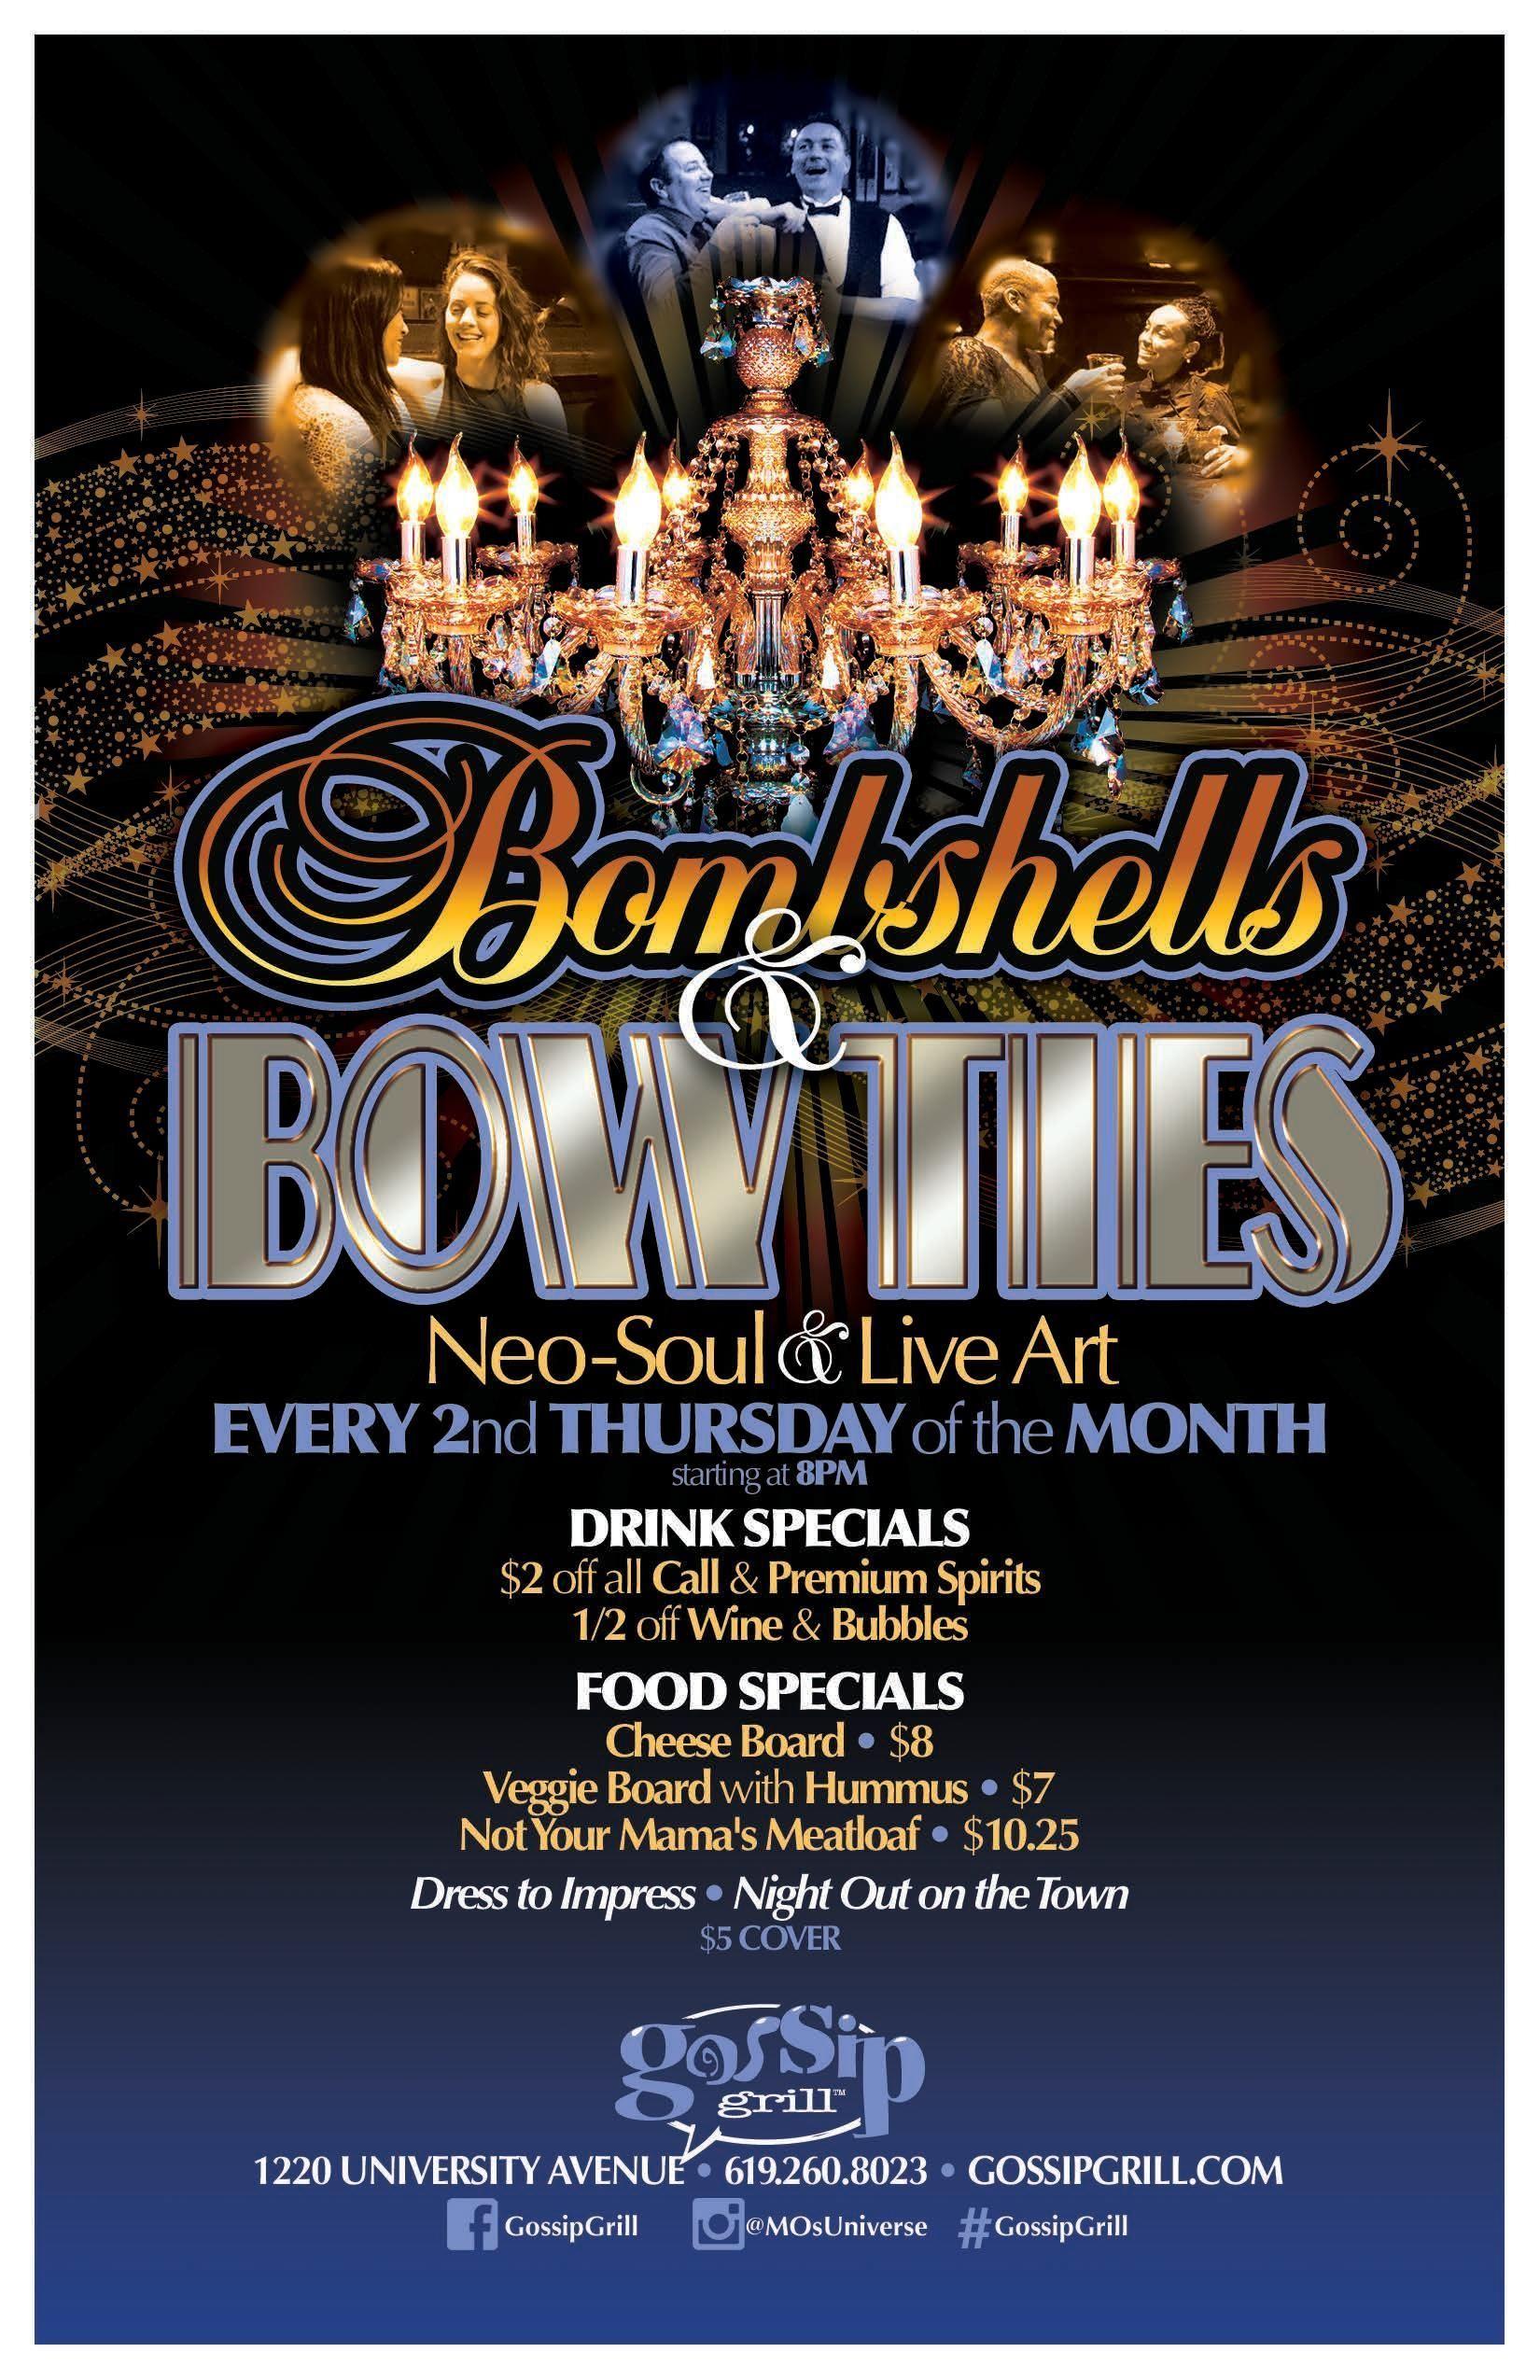 Bombshells & Bow Ties - Live Art & Neo Soul